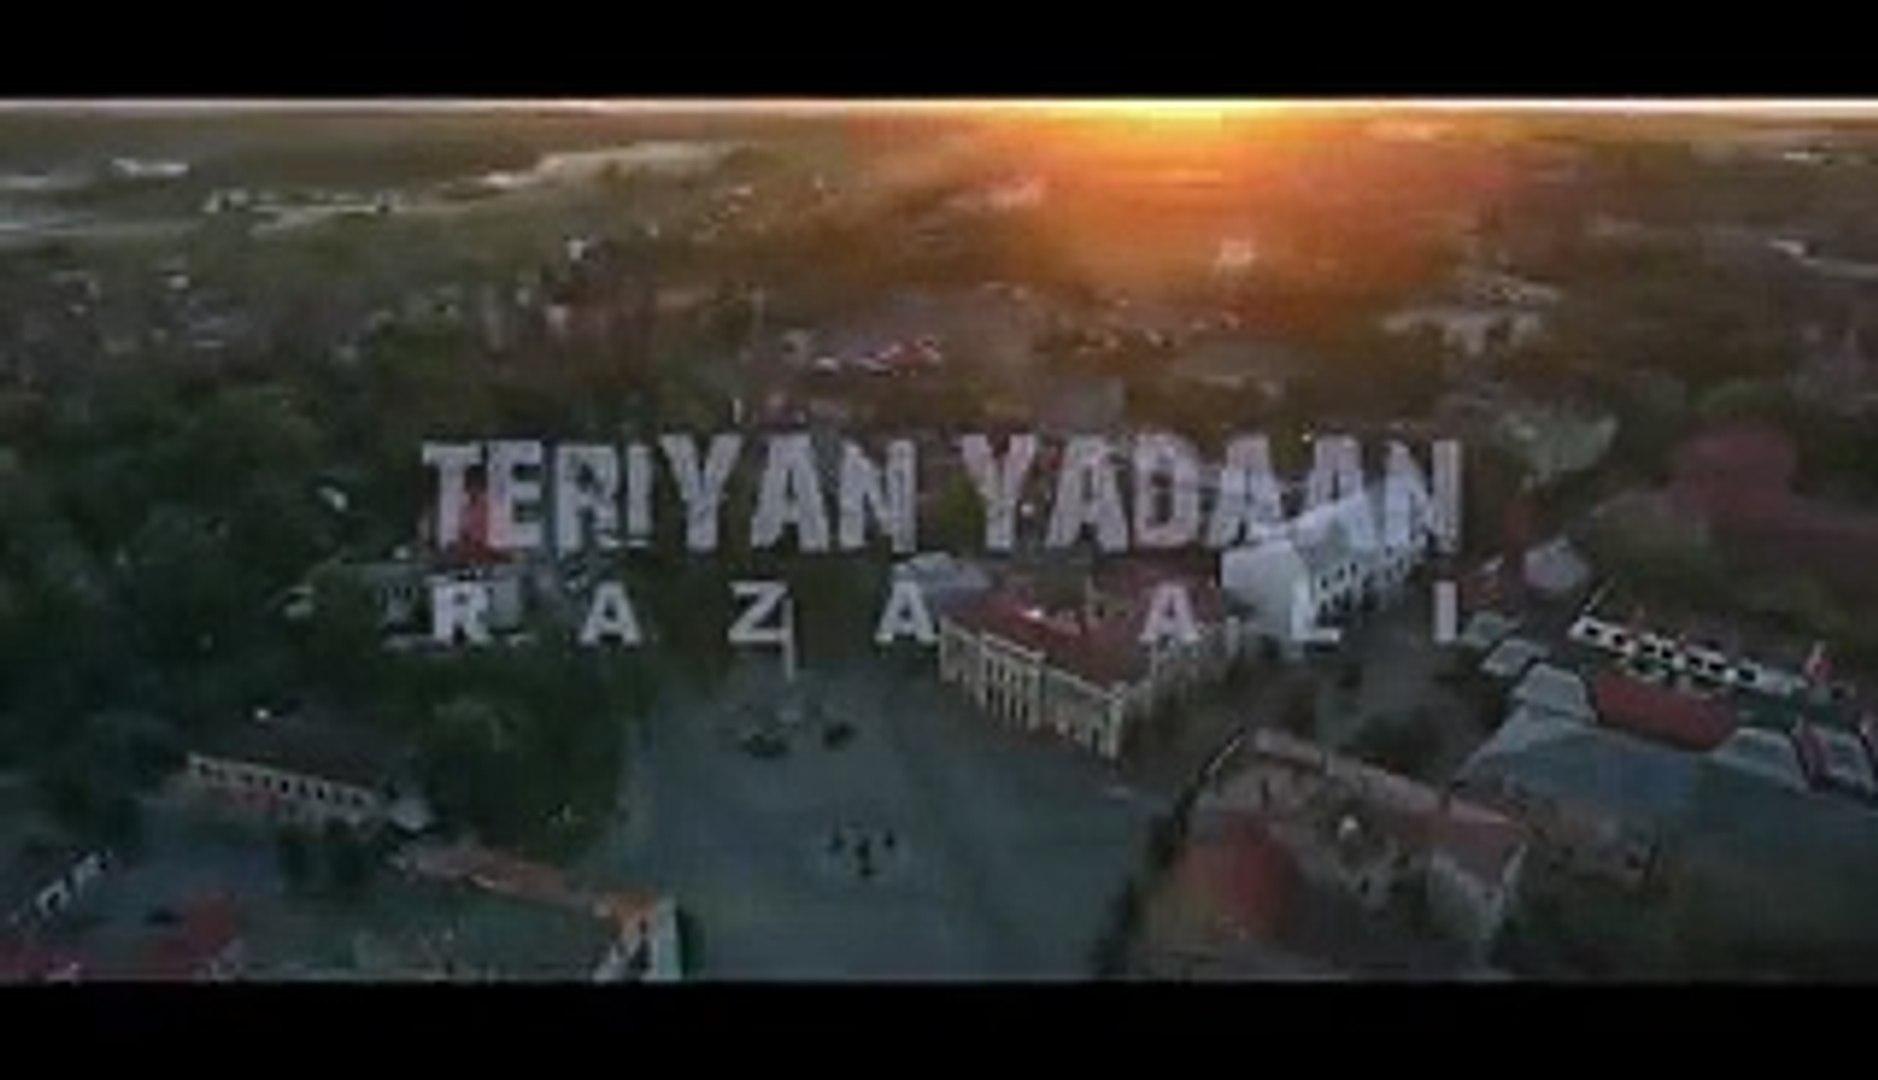 New Punjabi Songs 2015 I Teriyan Yadaan I Raza Ali I Latest Punjabi Songs 2016 top songs best songs